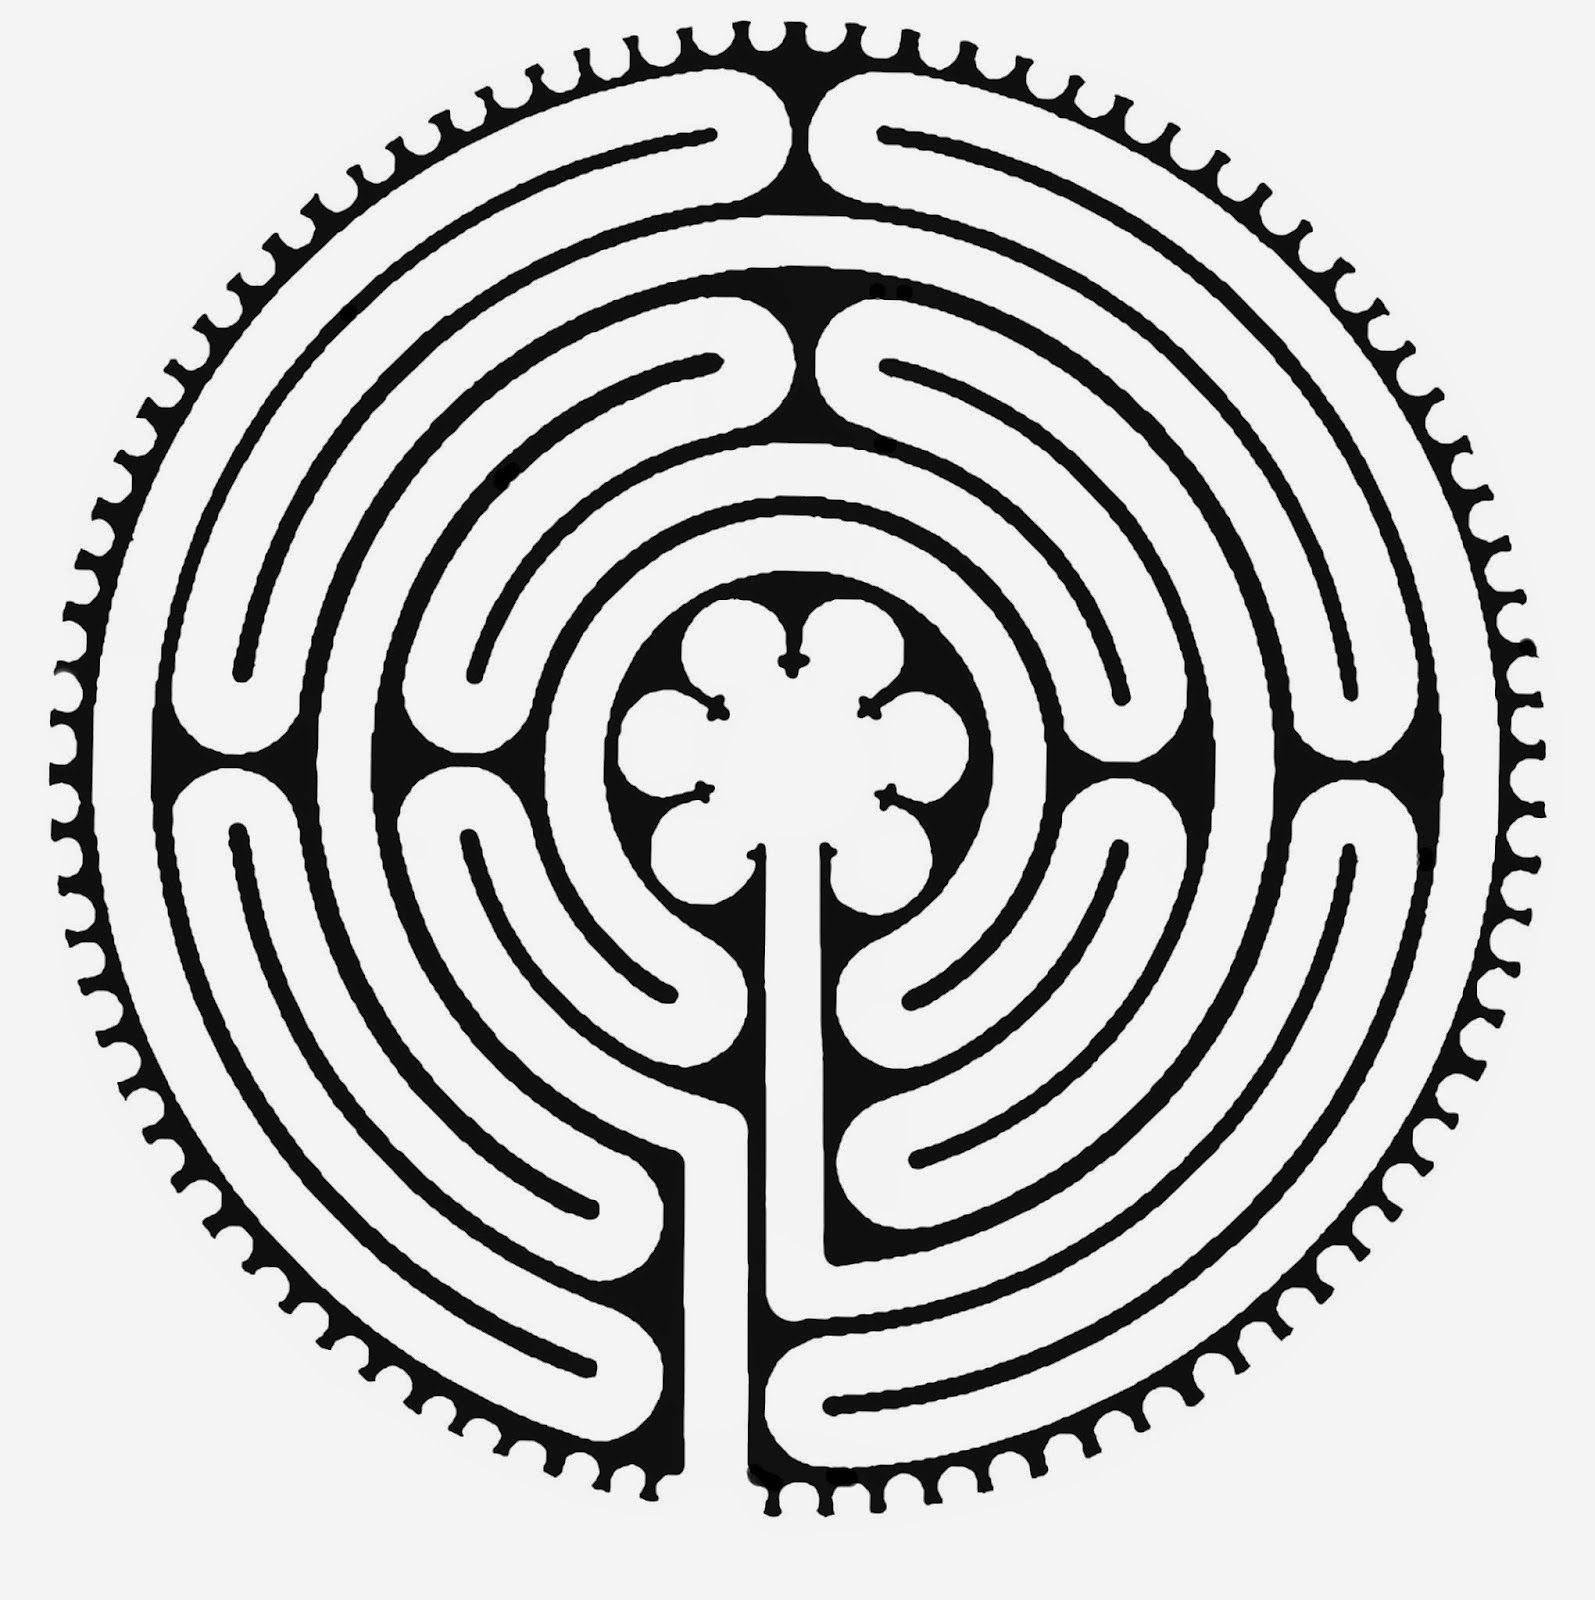 Labirinto Chartres Google Search Klondike Pinterest Mandala Circuit Classical Labyrinth From A 5circuit